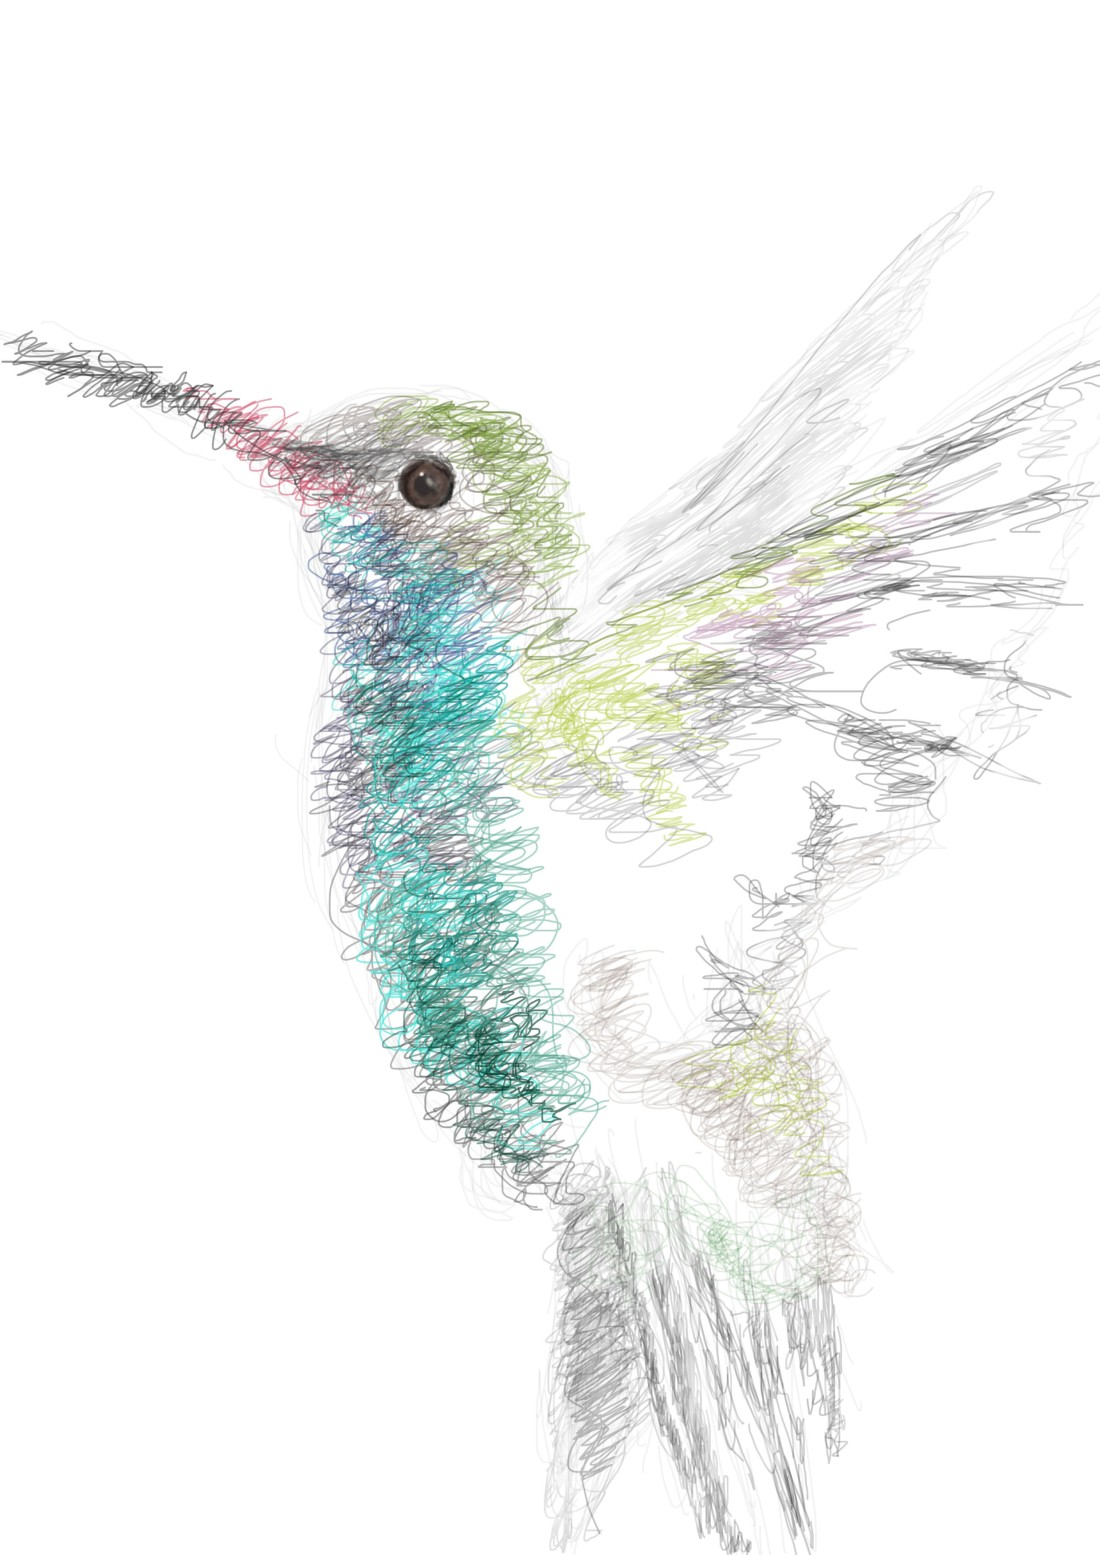 Linework - Hummingbird illustration on photoshop